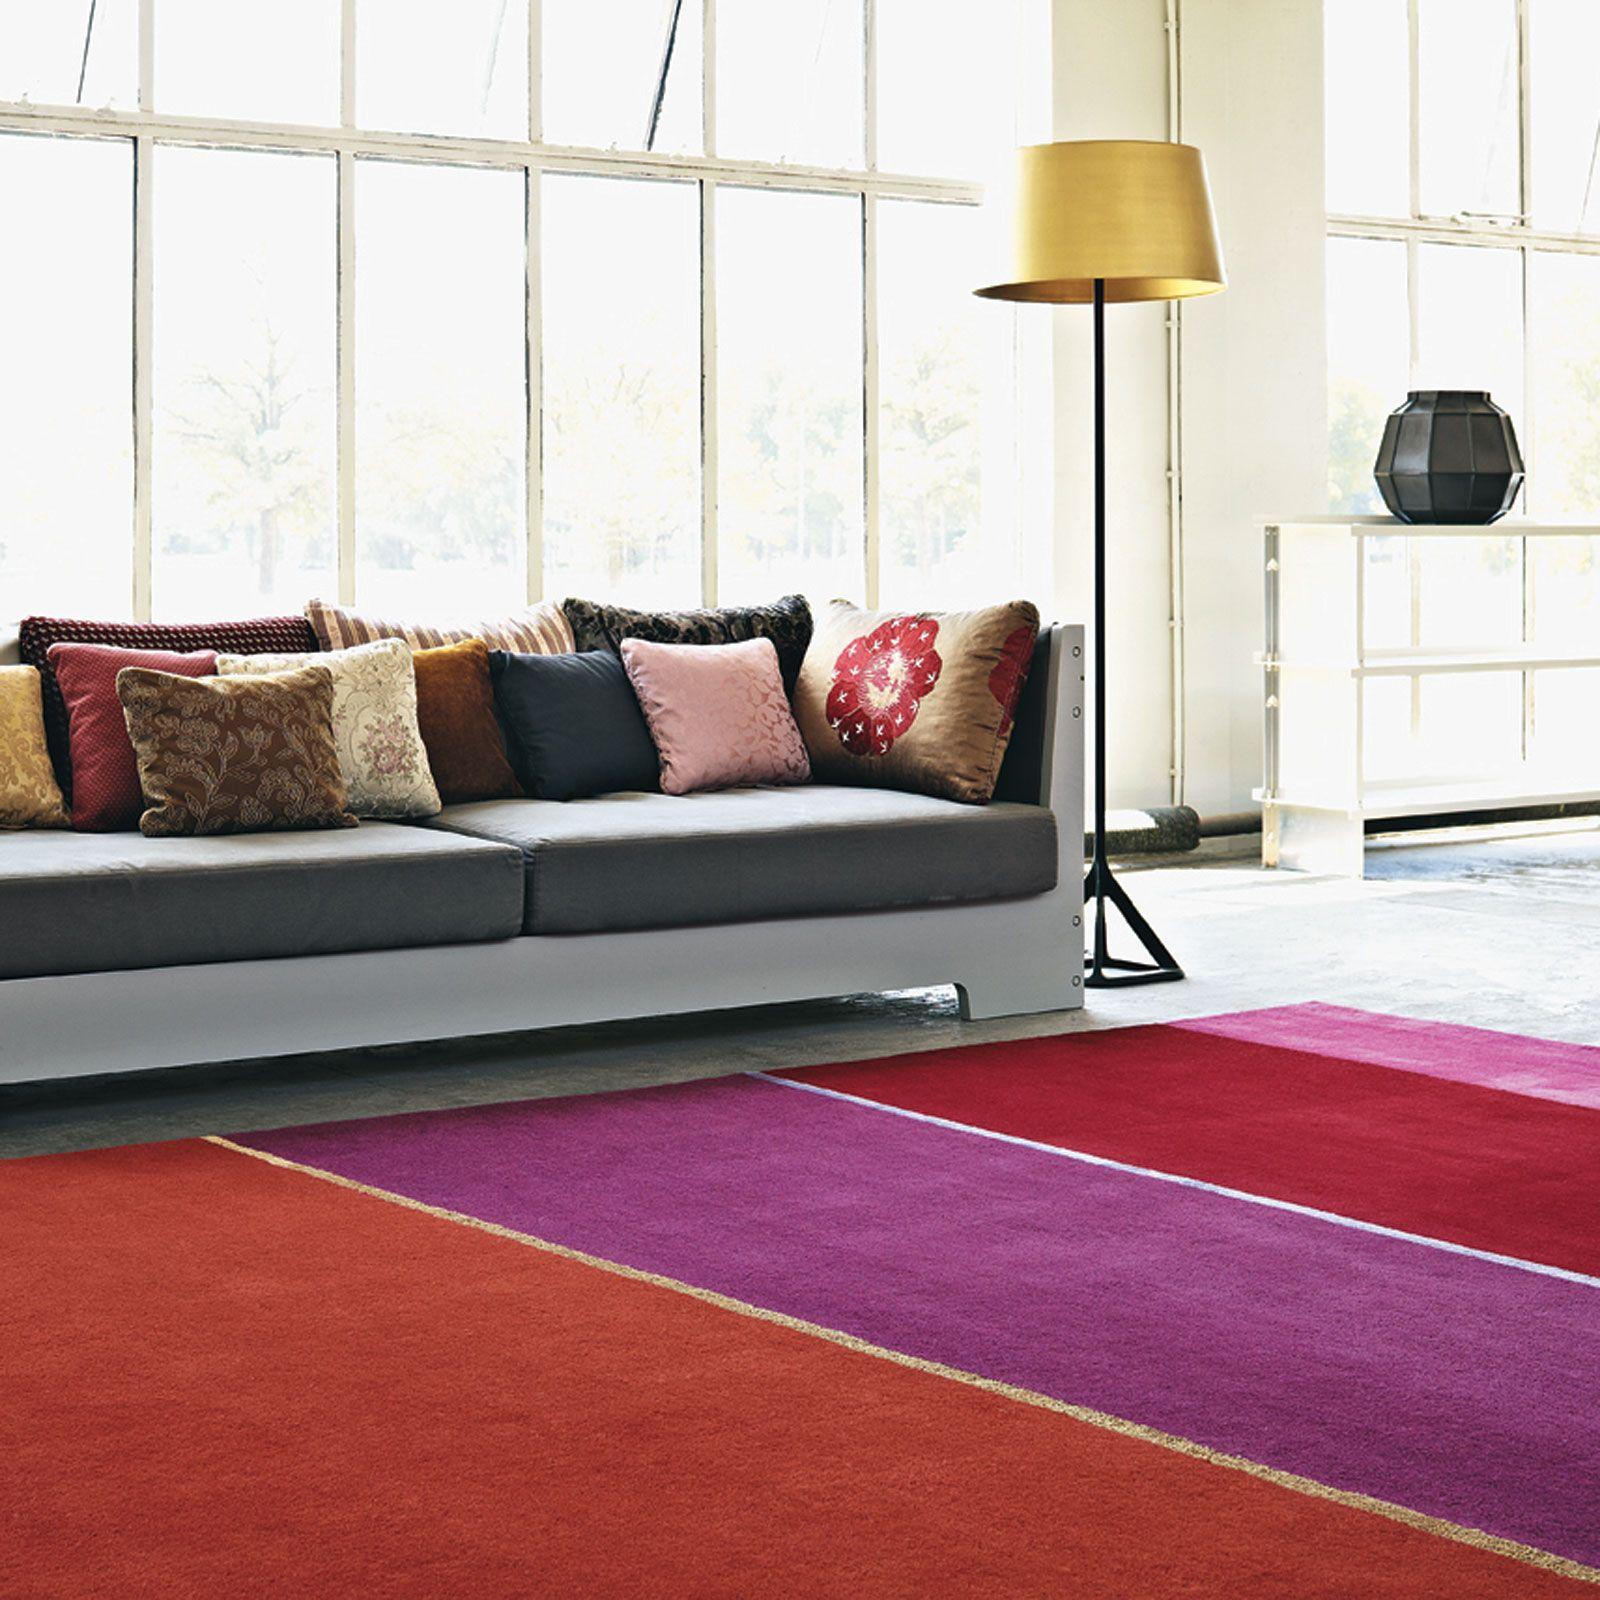 Estella Horizon 83500 Wool Rugs By Brink Campman Free Uk Delivery Red Rugs Modern Rugs Rug Design